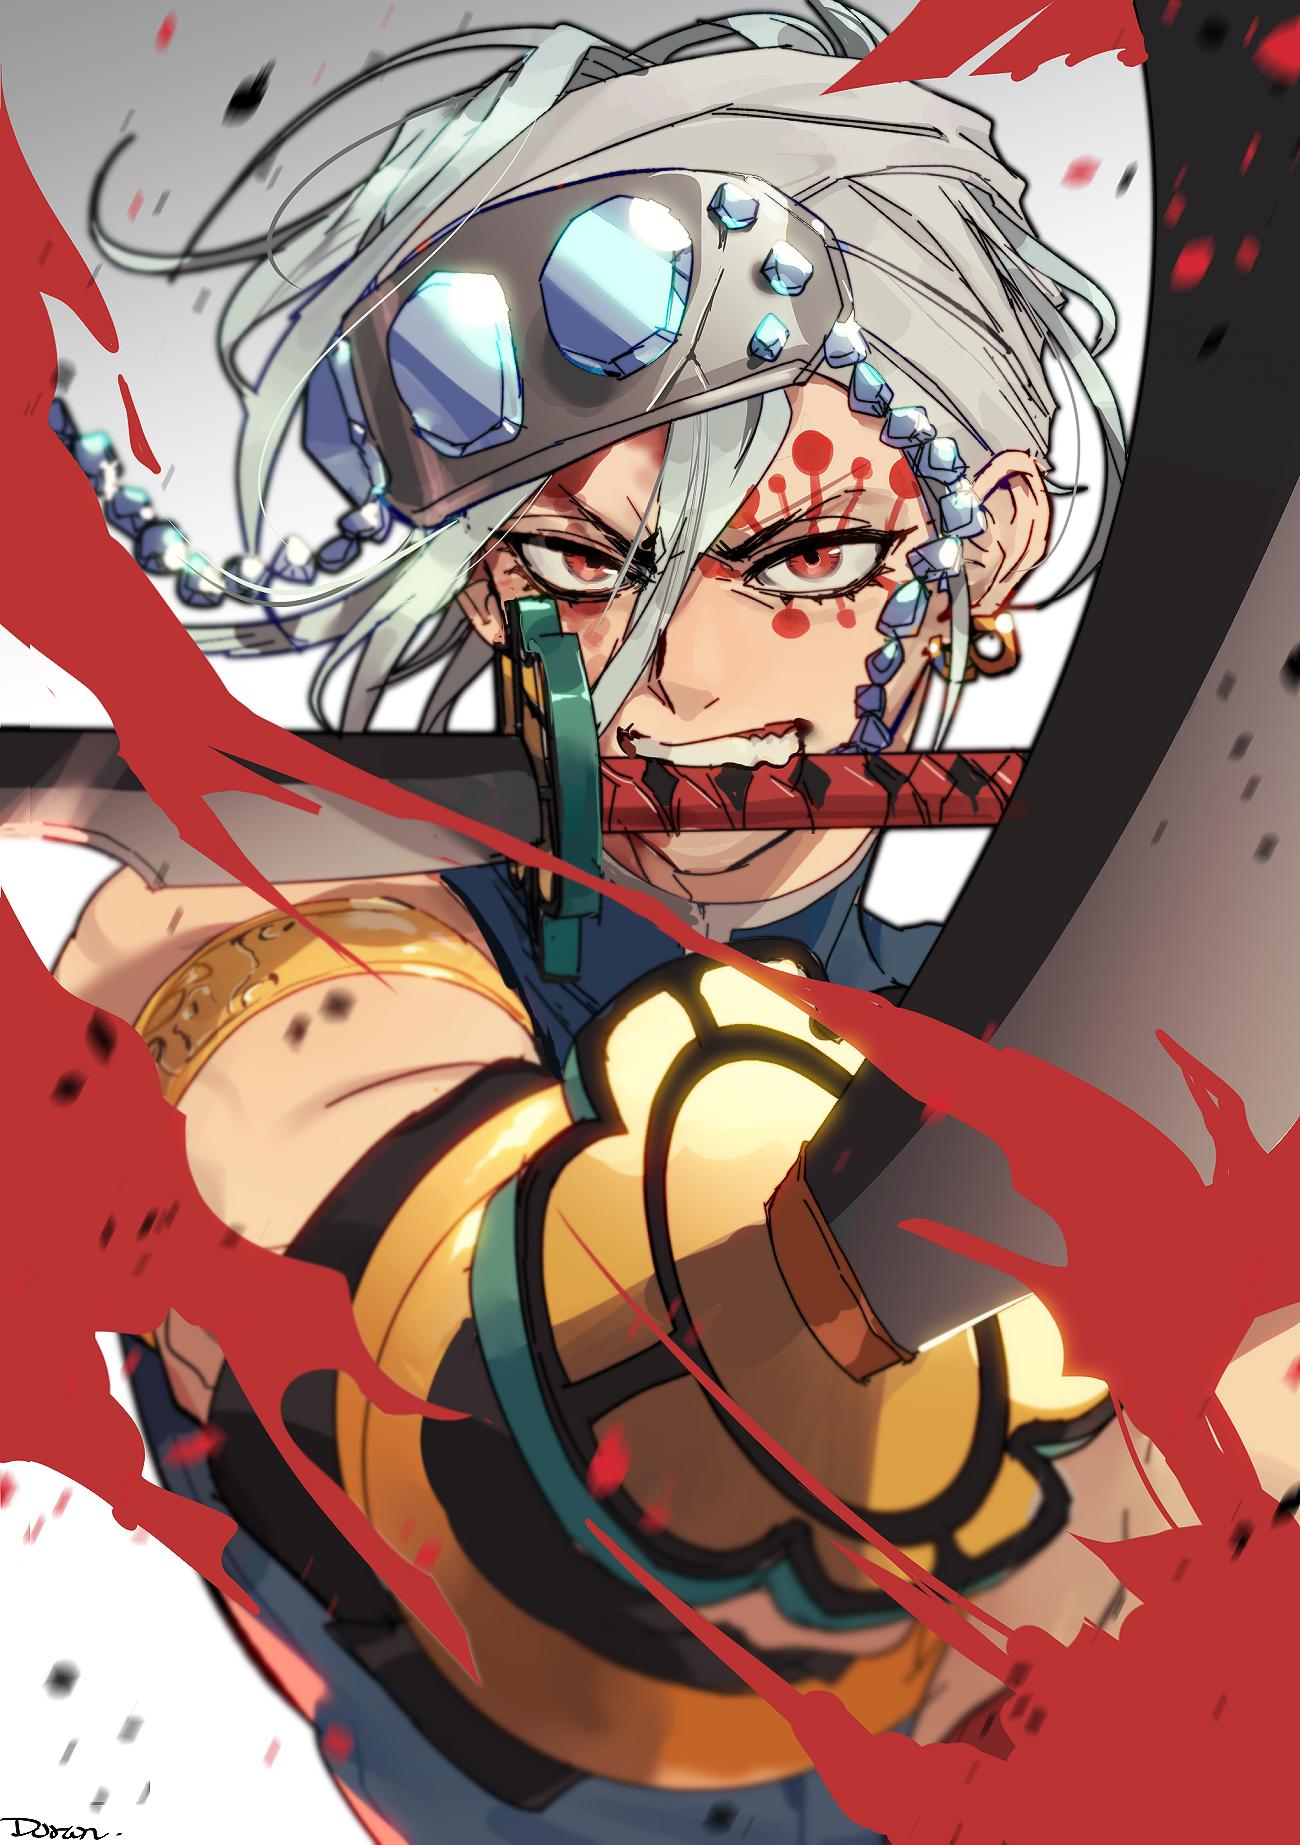 Uzui Tengen Kimetsu No Yaiba Image 2684018 Zerochan Anime Image Board Uzui tengen is a character from kimetsu no yaiba. uzui tengen kimetsu no yaiba image